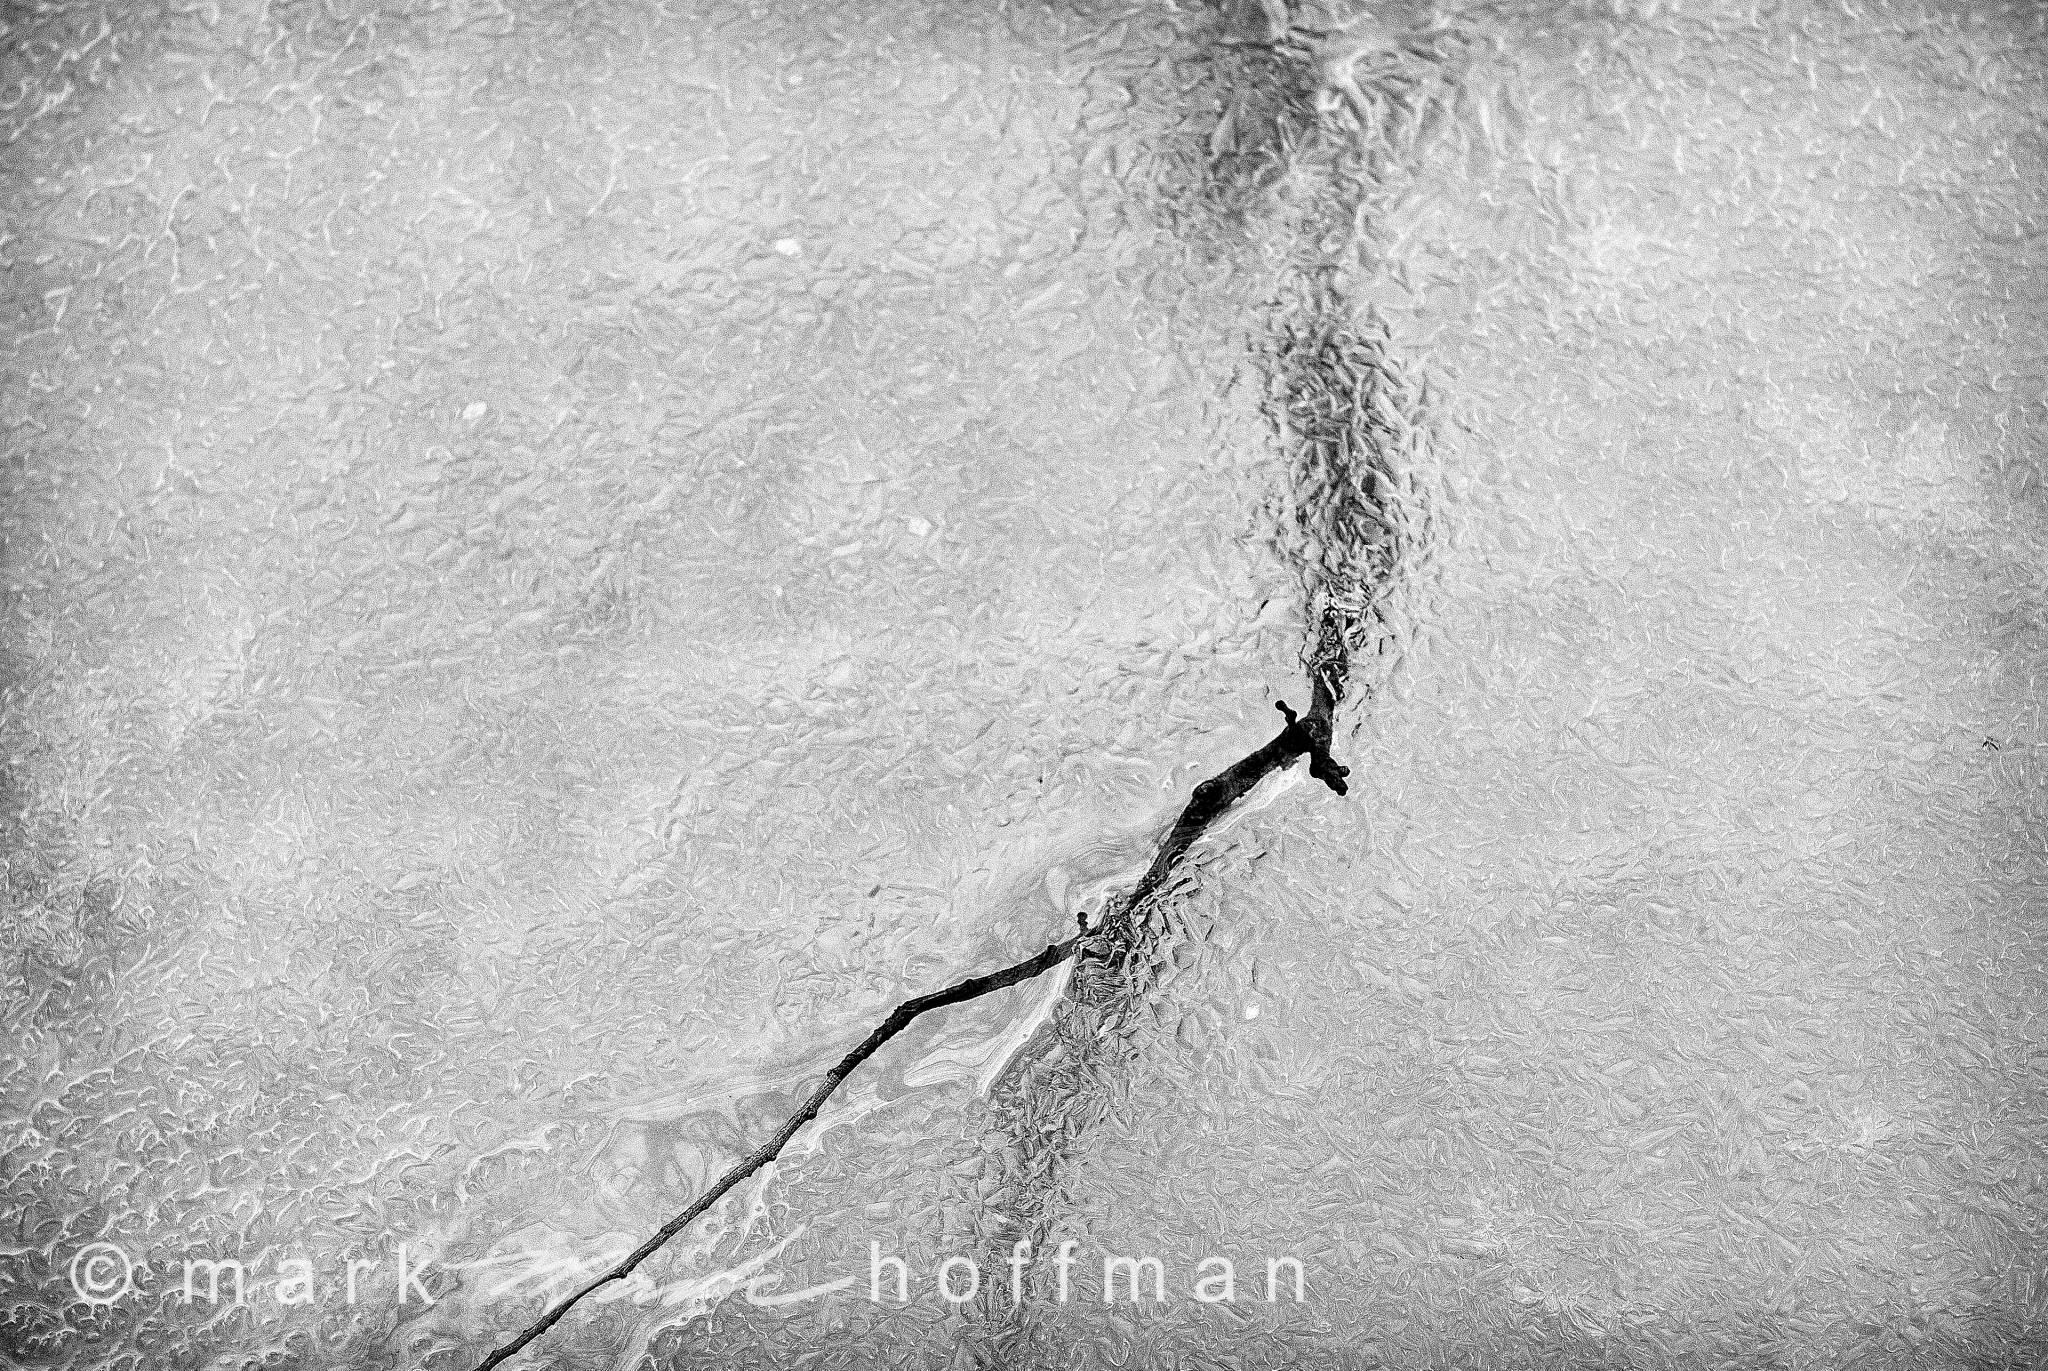 Mark_Hoffman_ND25738_Edit_cap1_var1.jpg